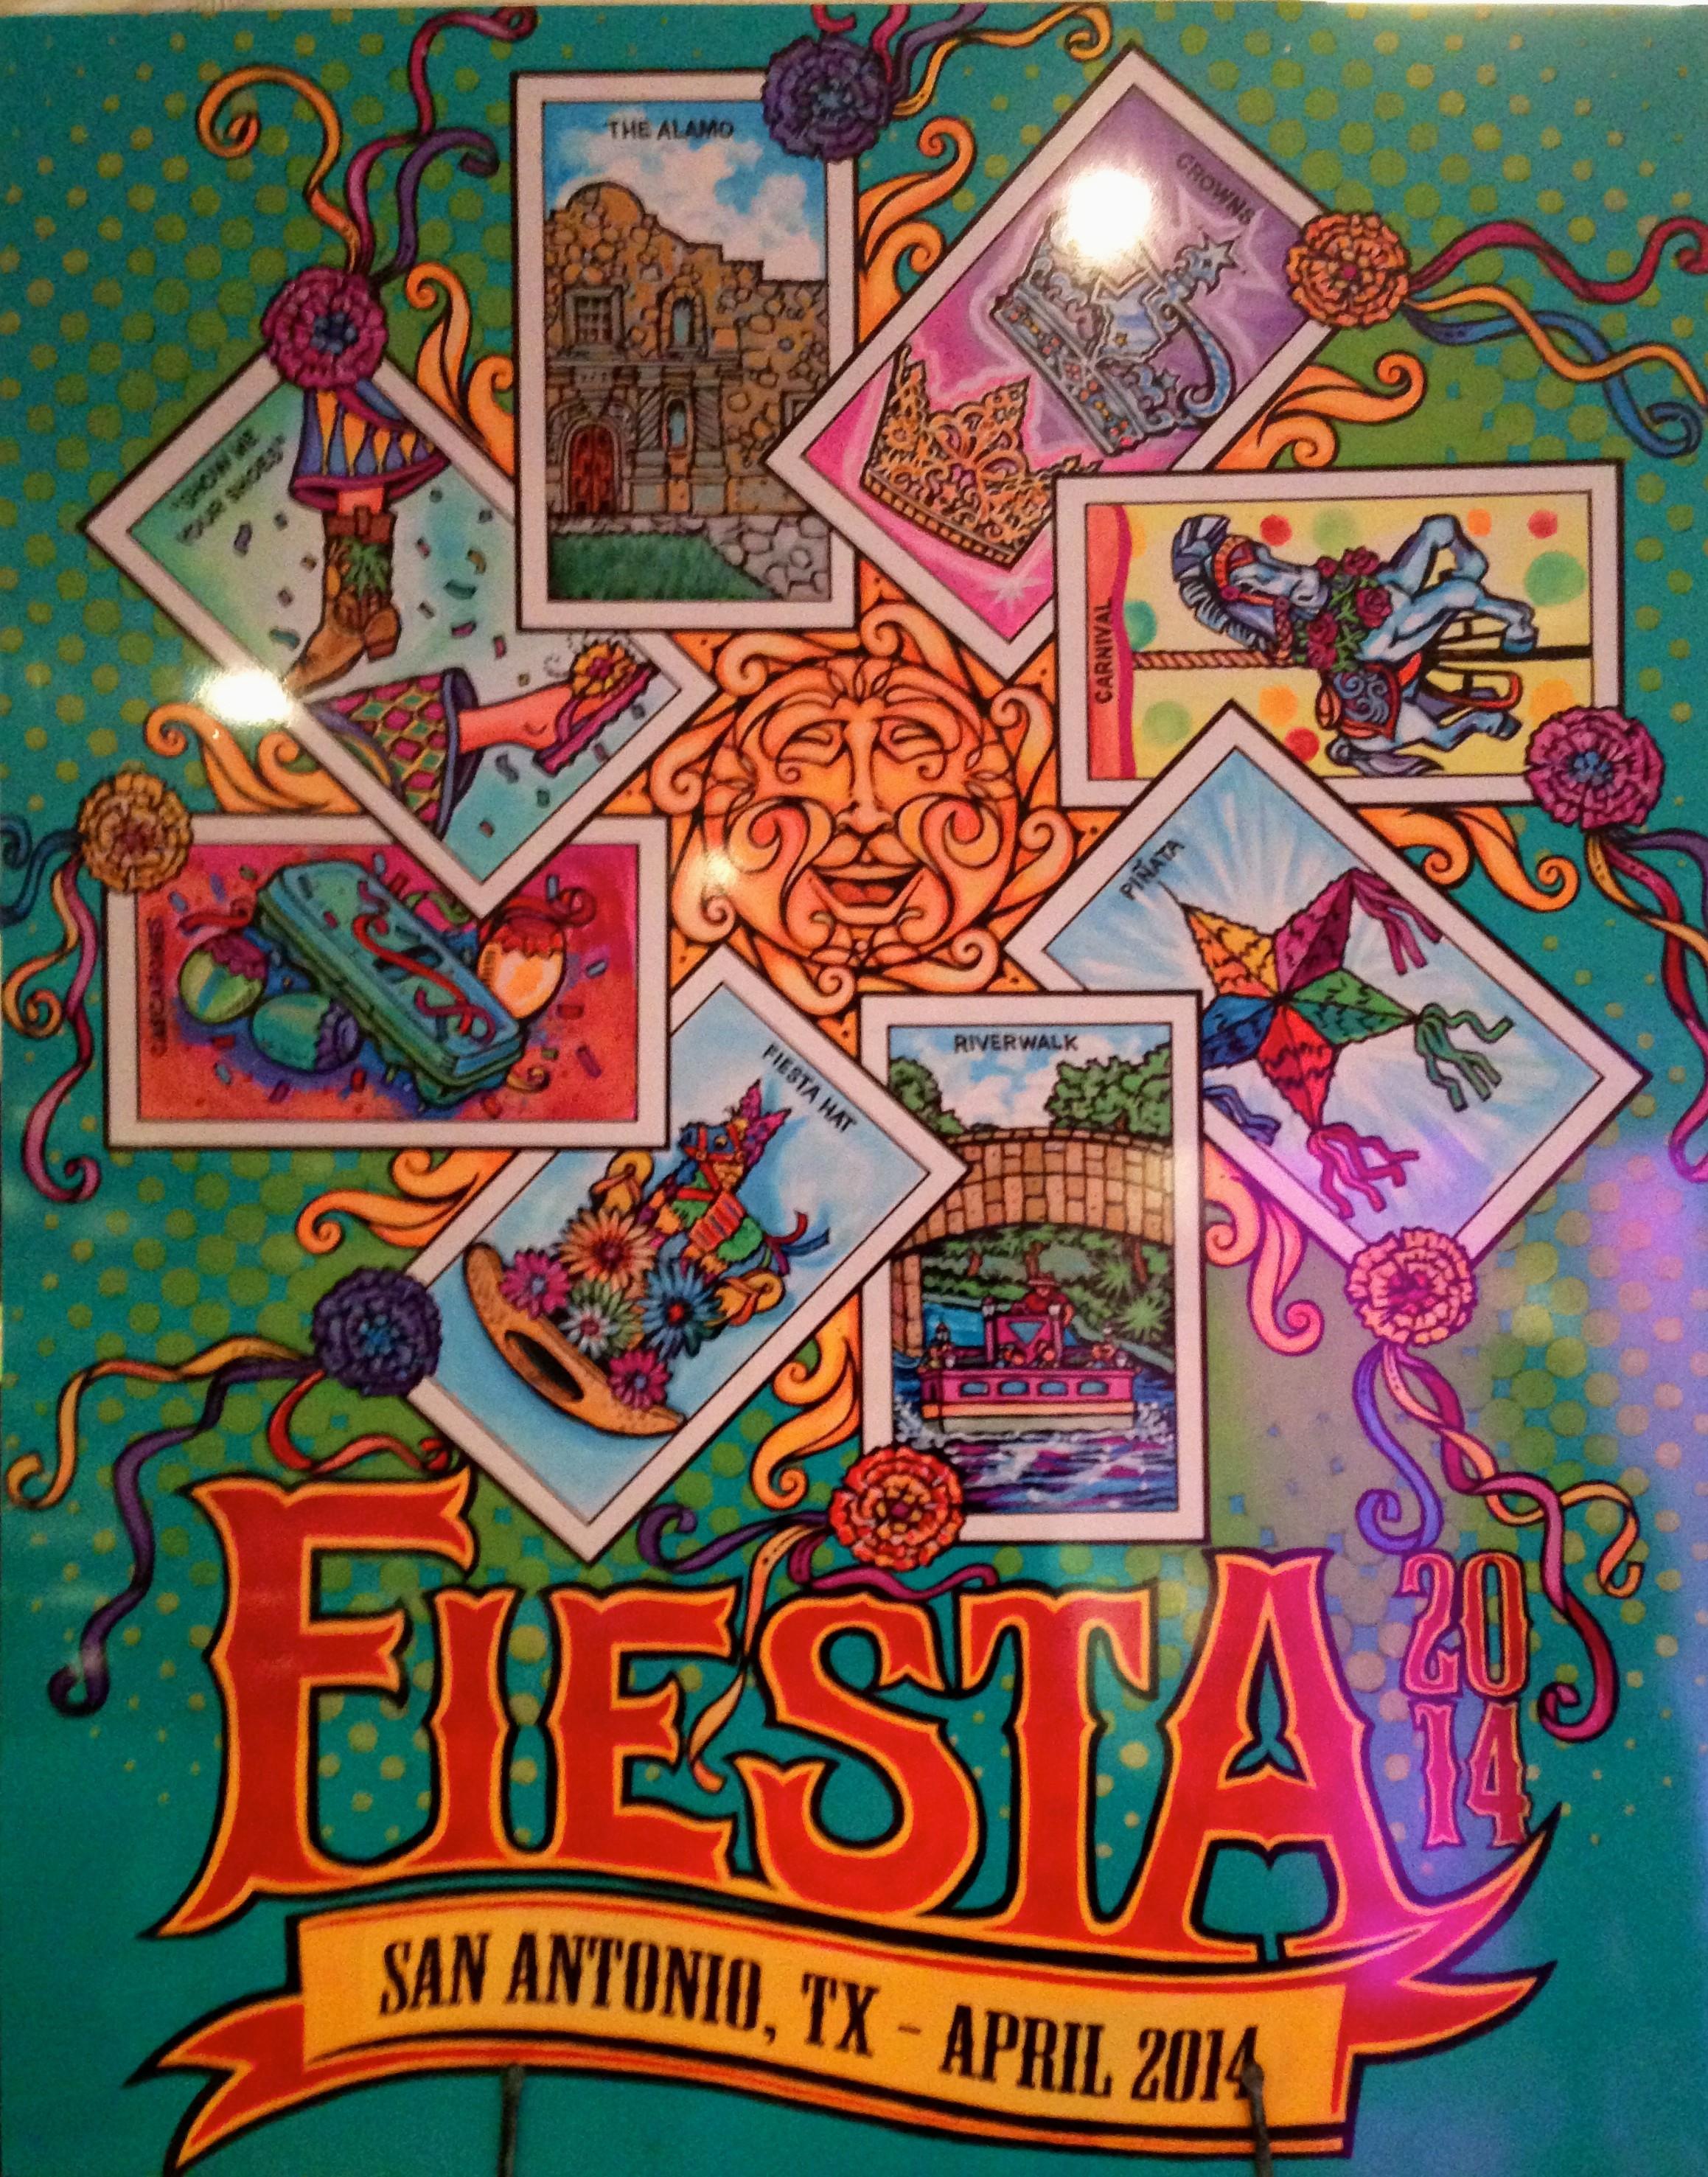 Fiesta san antonio - Lutheran coronation now accepting duchess and